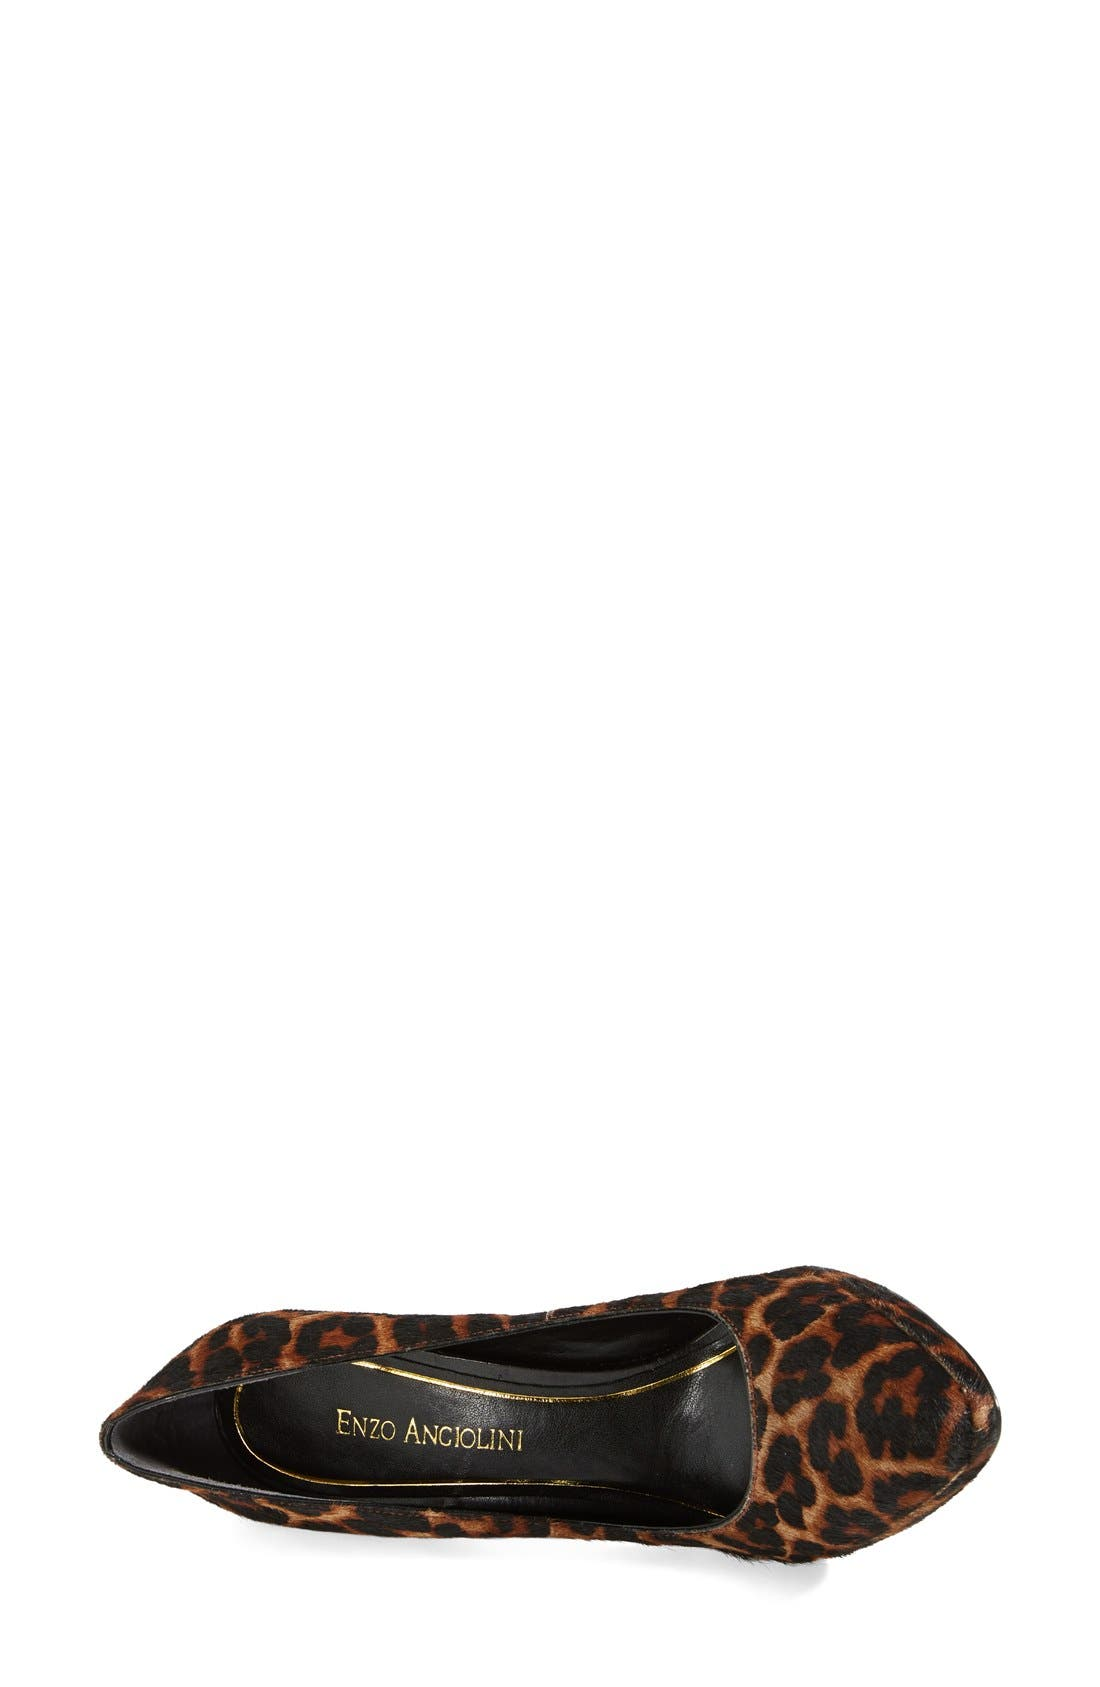 Alternate Image 3  - Enzo Angiolini 'Samendra' Cheetah Spot Calf Hair Platform Pump (Women)